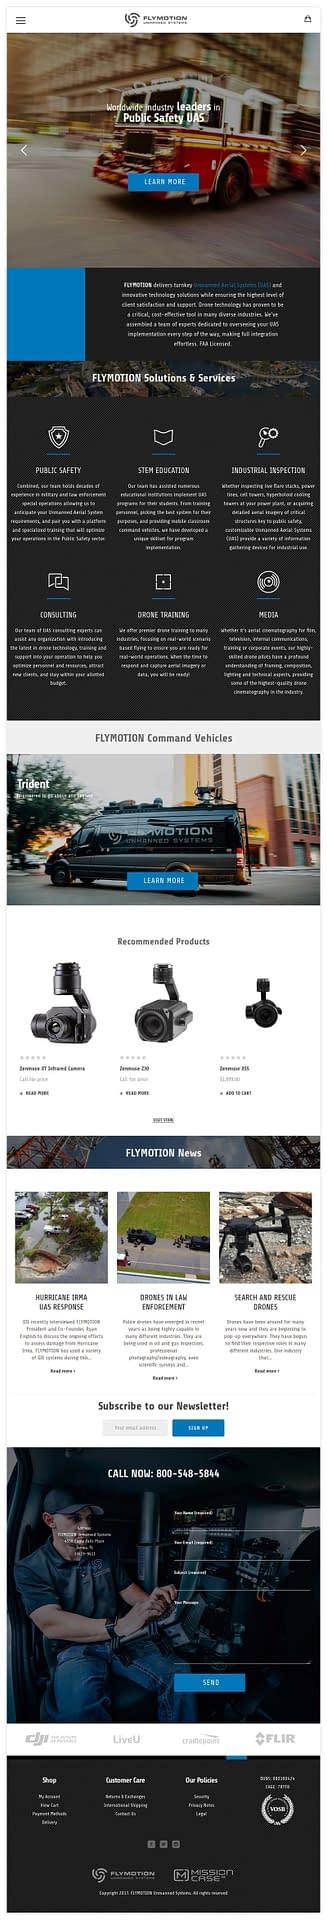 eximdesign_flymotion_web.jpg